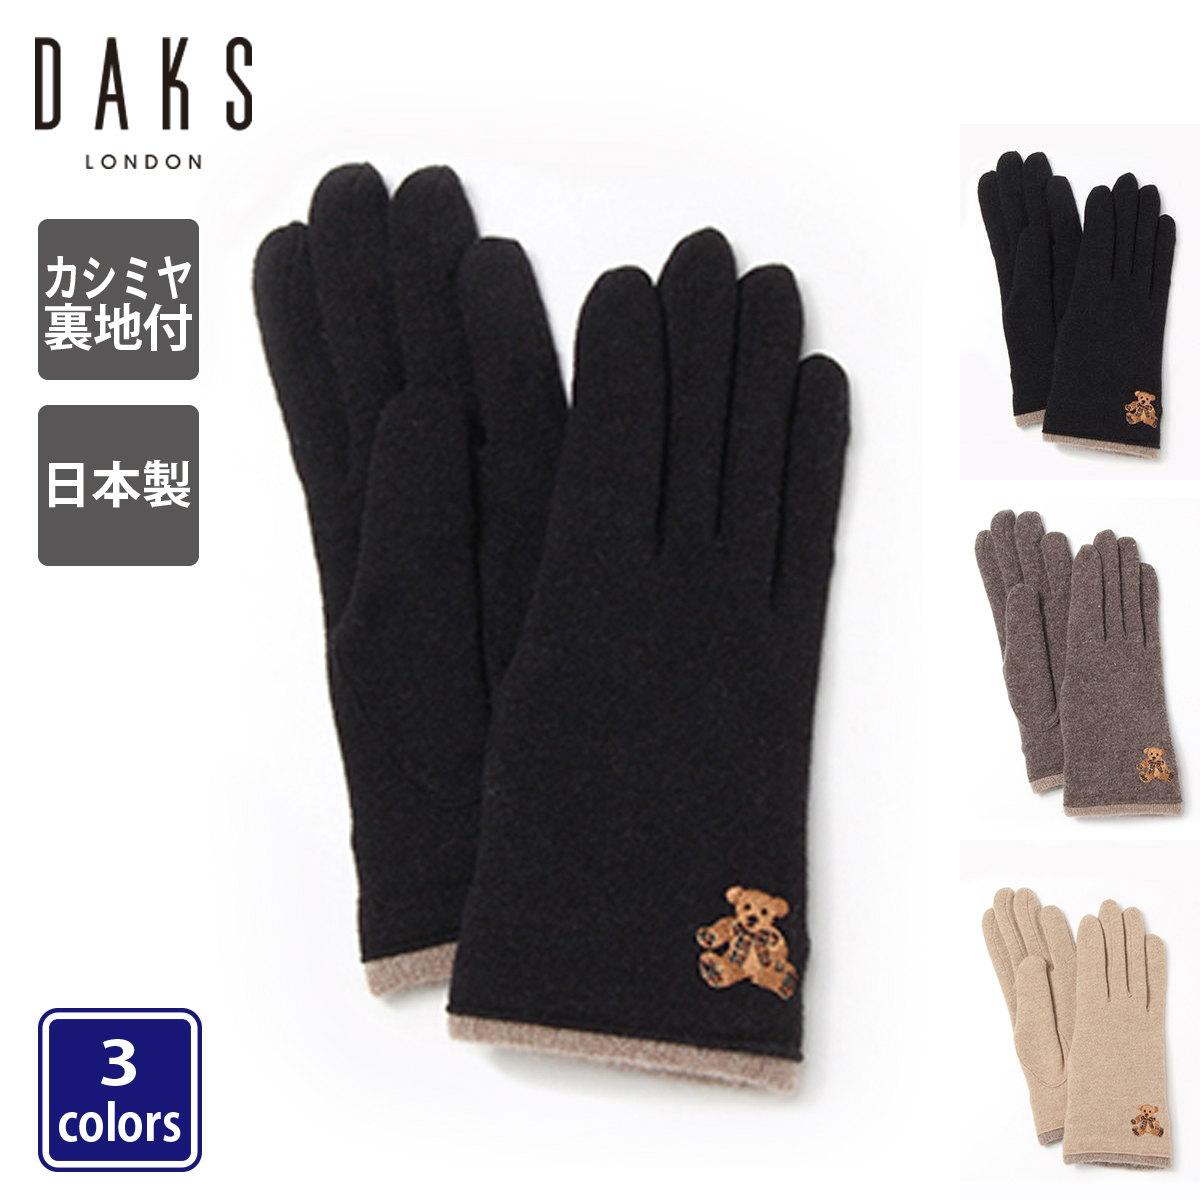 【SALE】DAKSテディカシミヤ100%裏地 暖か二重ジャージ手袋 テディベアの刺繍が可愛い レディース 手袋 21〜22cm(M)